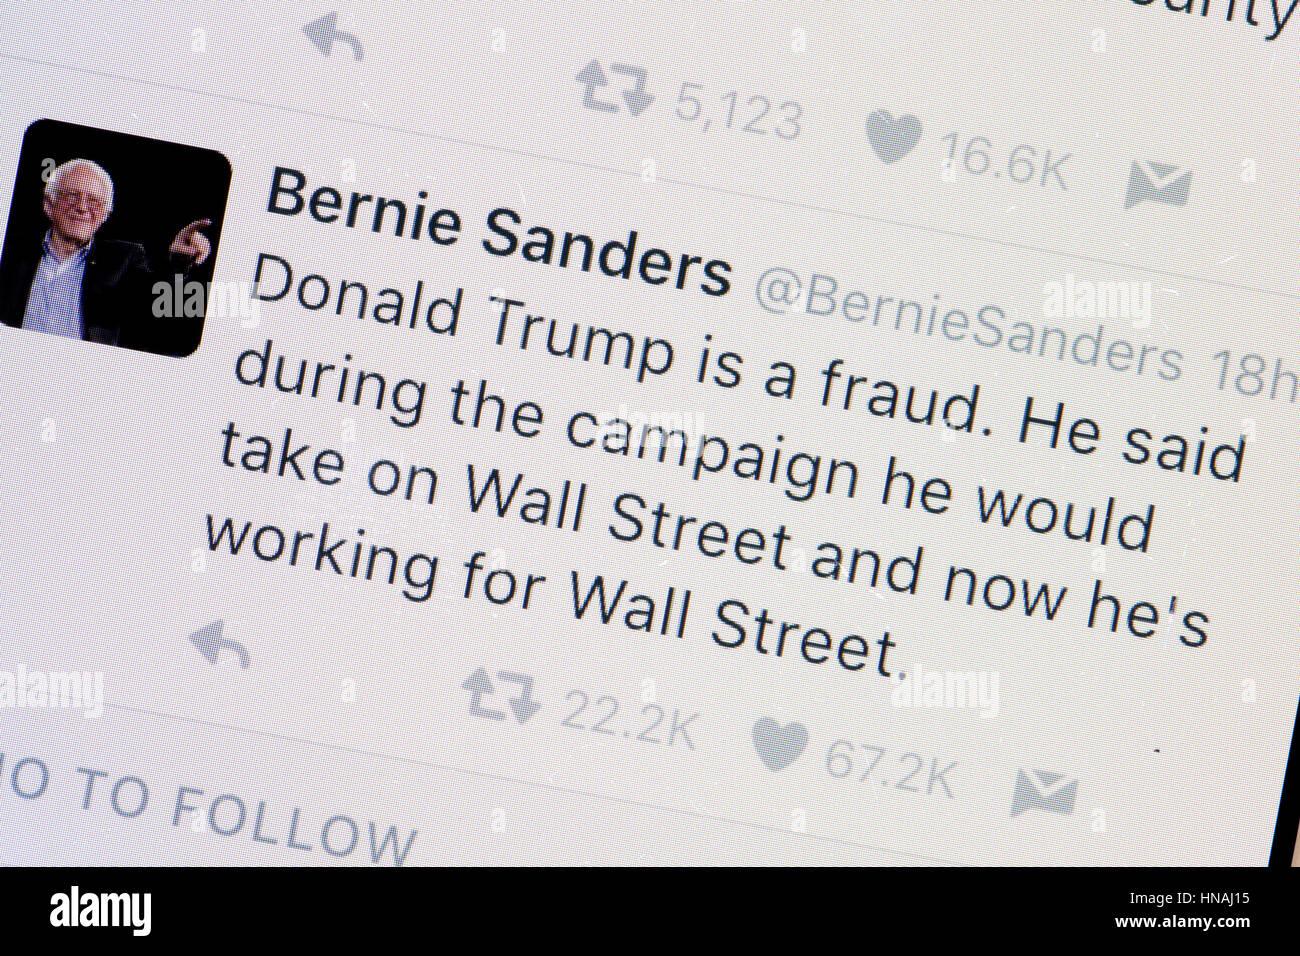 Senator Bernie Sanders Twitter account - USA - Stock Image